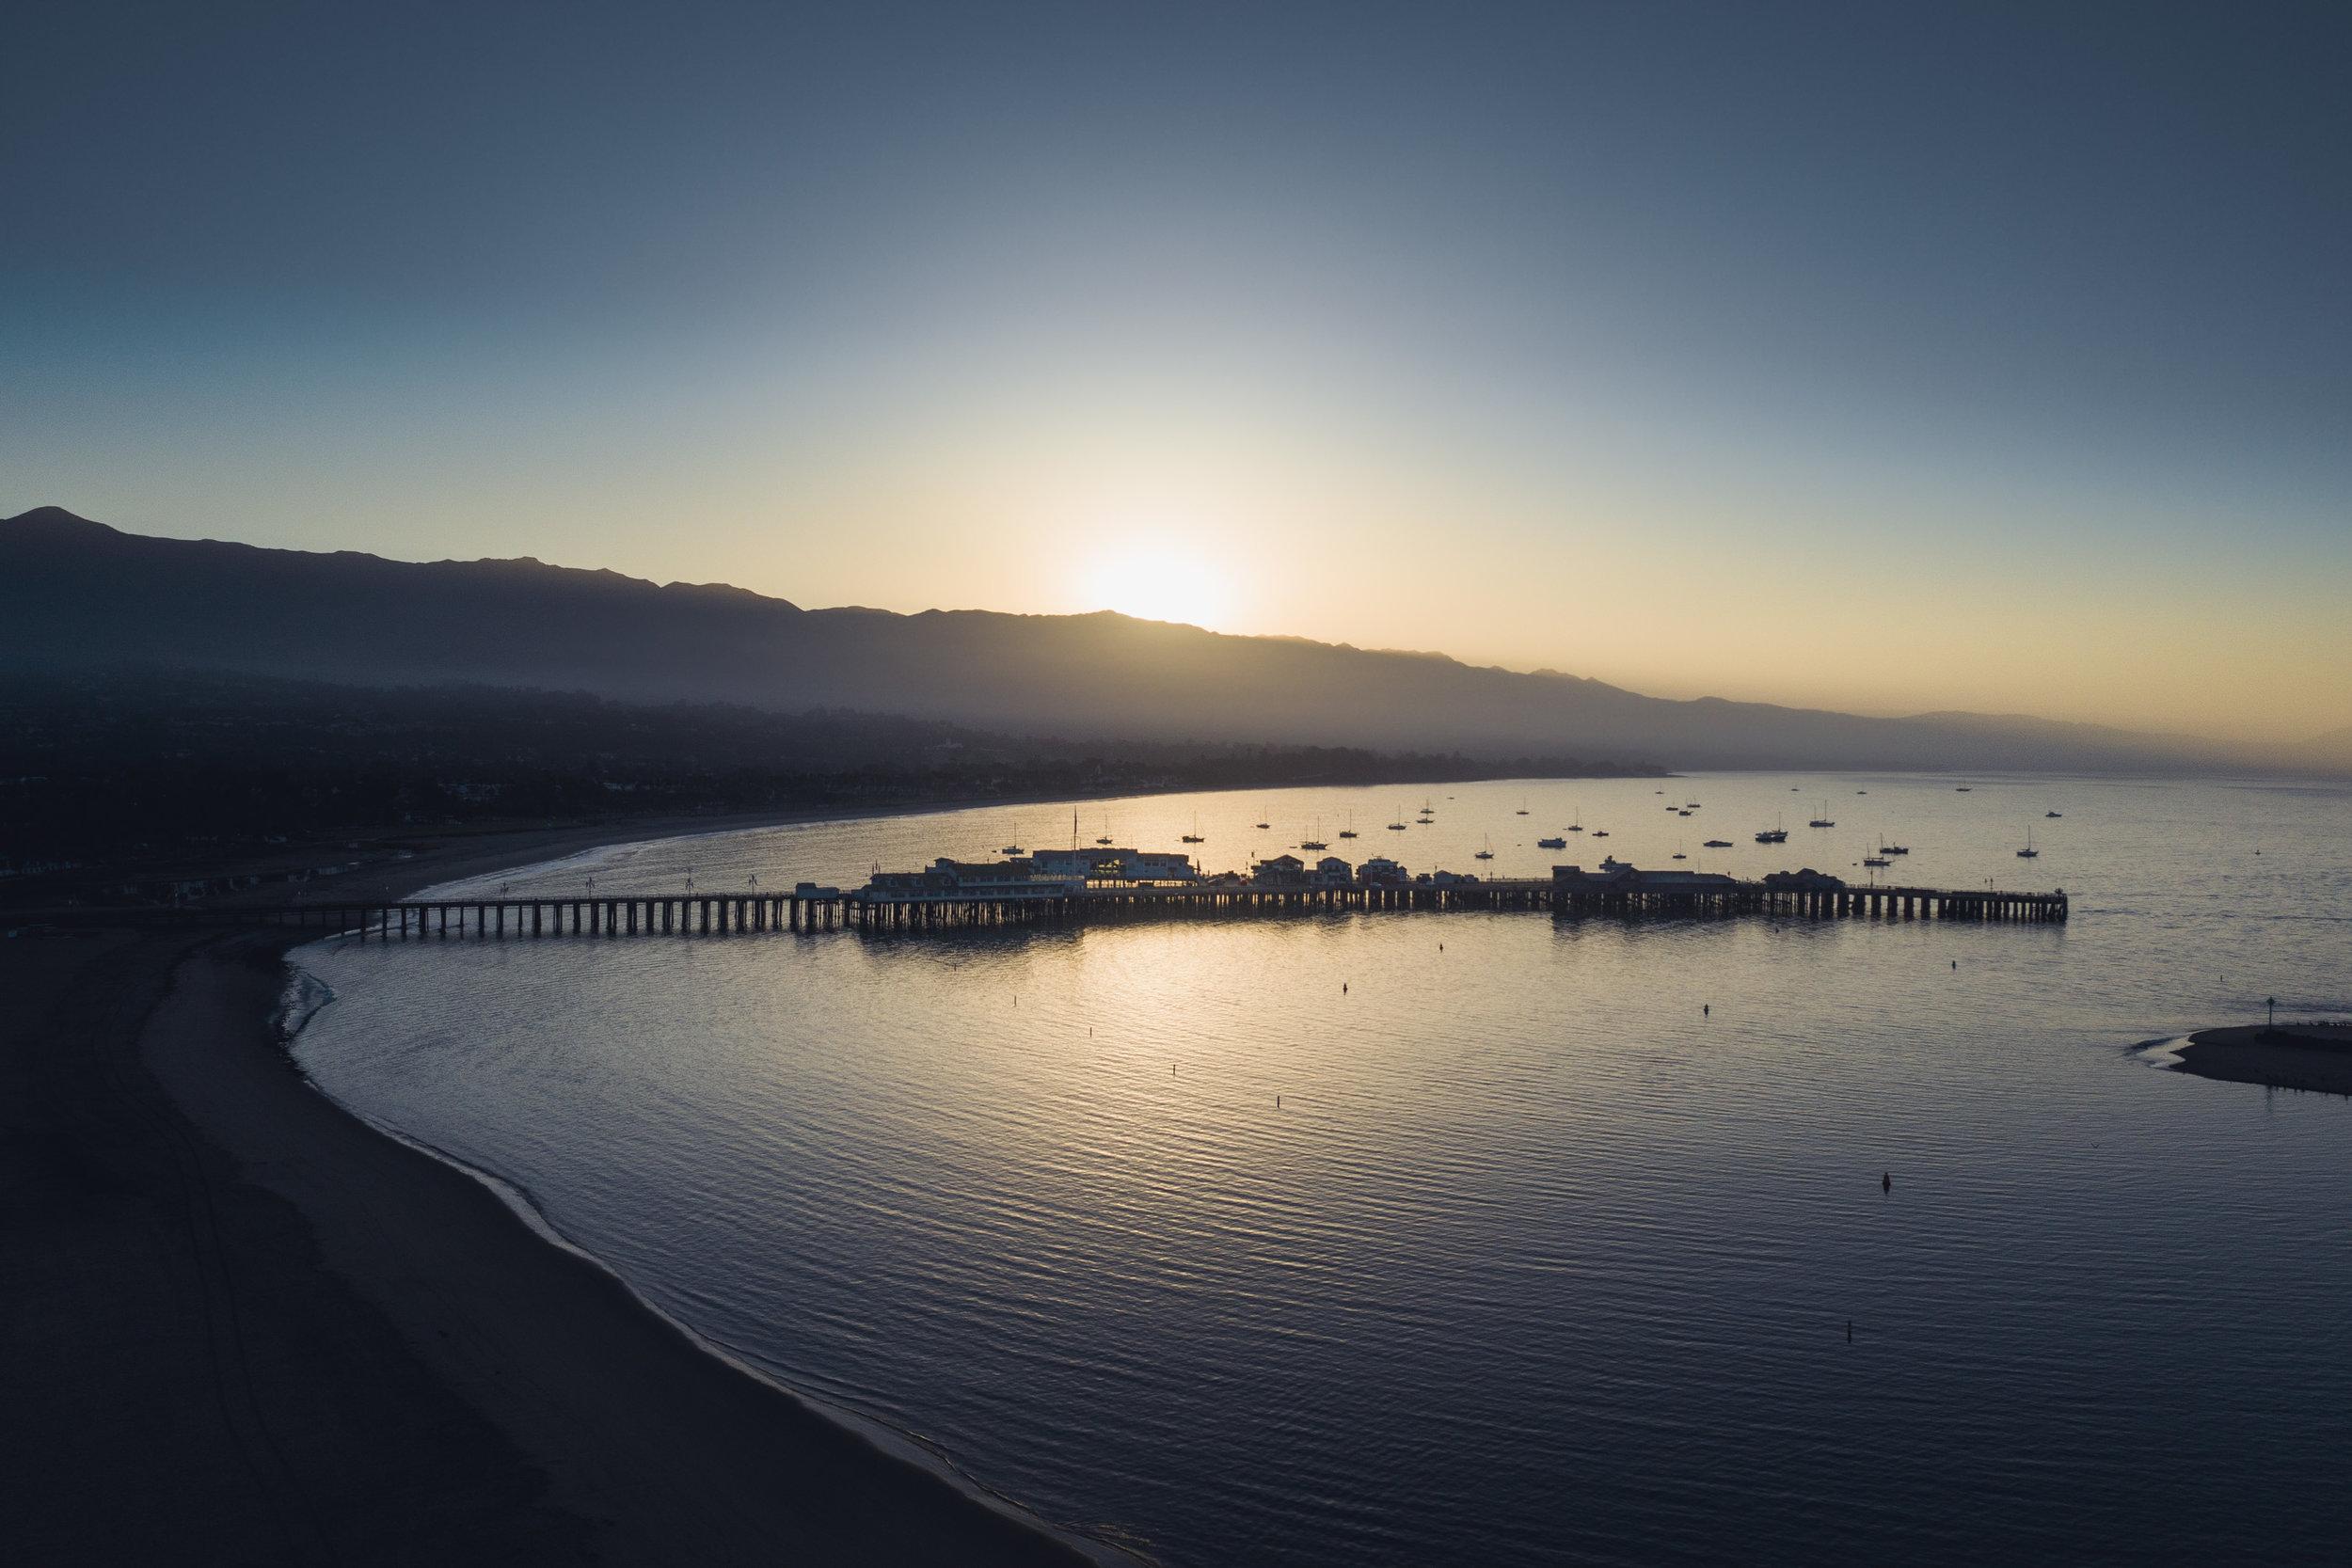 Los-Angeles-Aerial-Drone-Photographer-0626.jpg